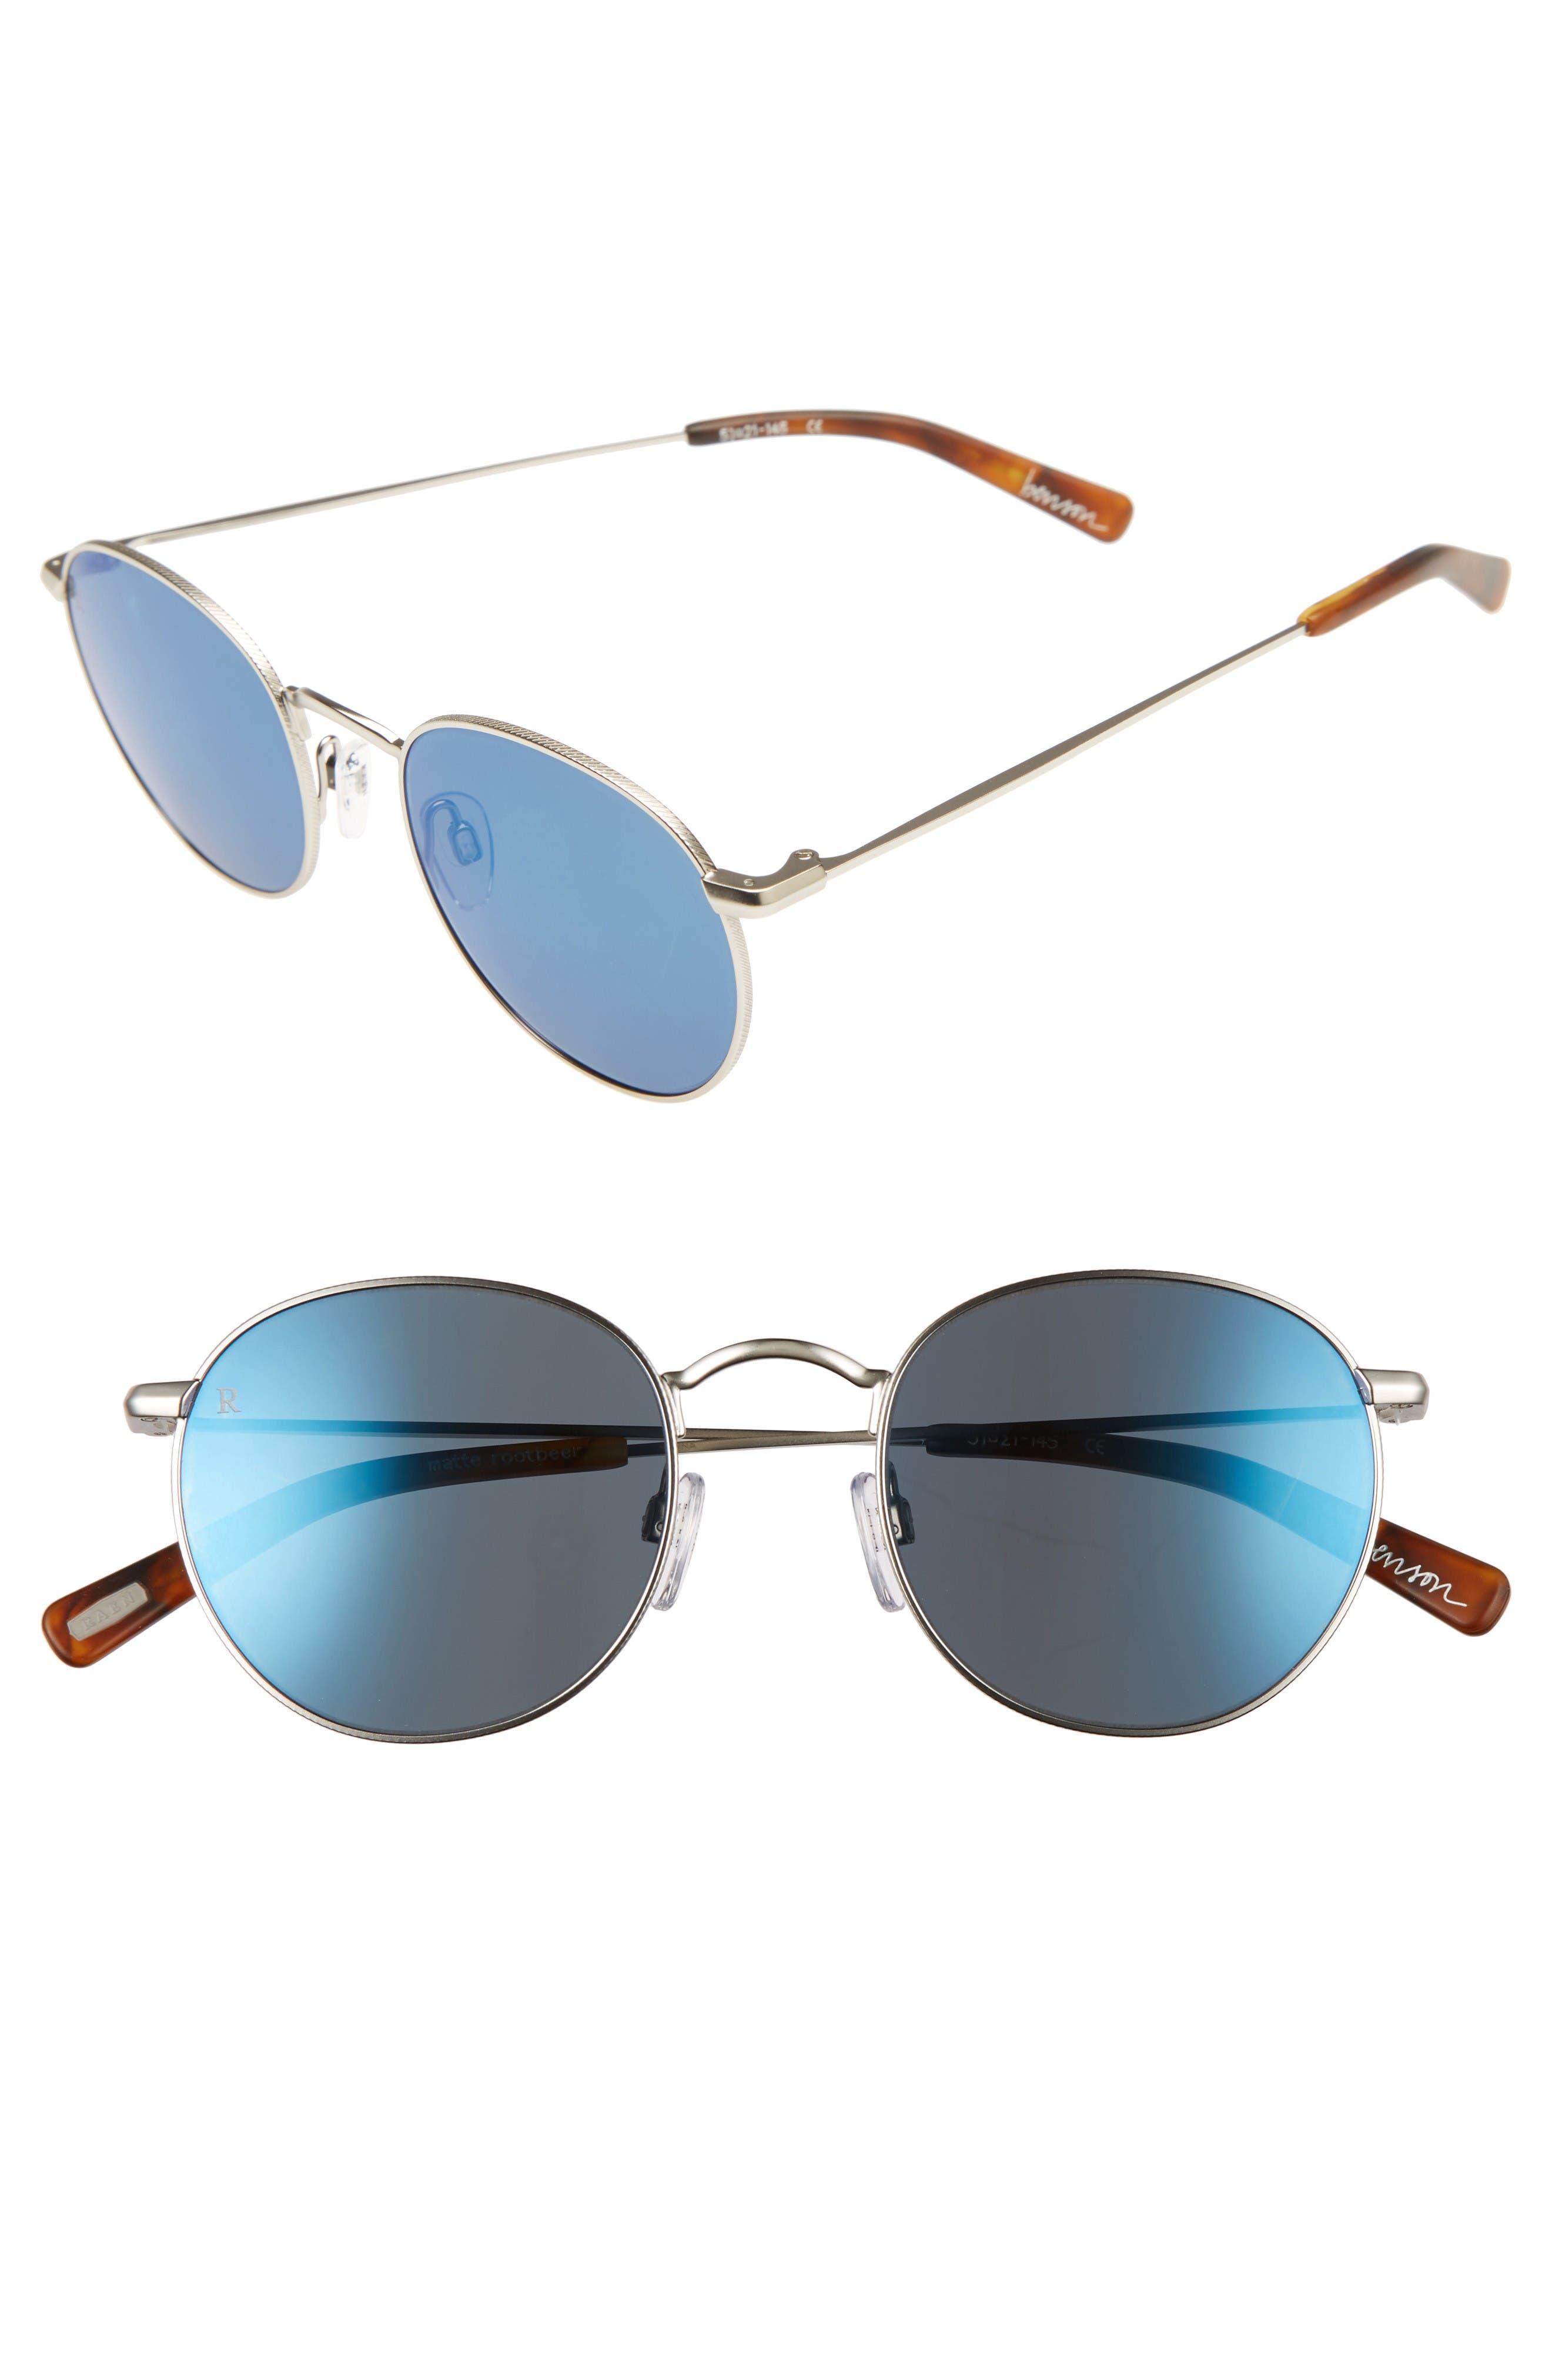 RAEN Benson 51Mm Sunglasses - Silver/ Matte Root Beer